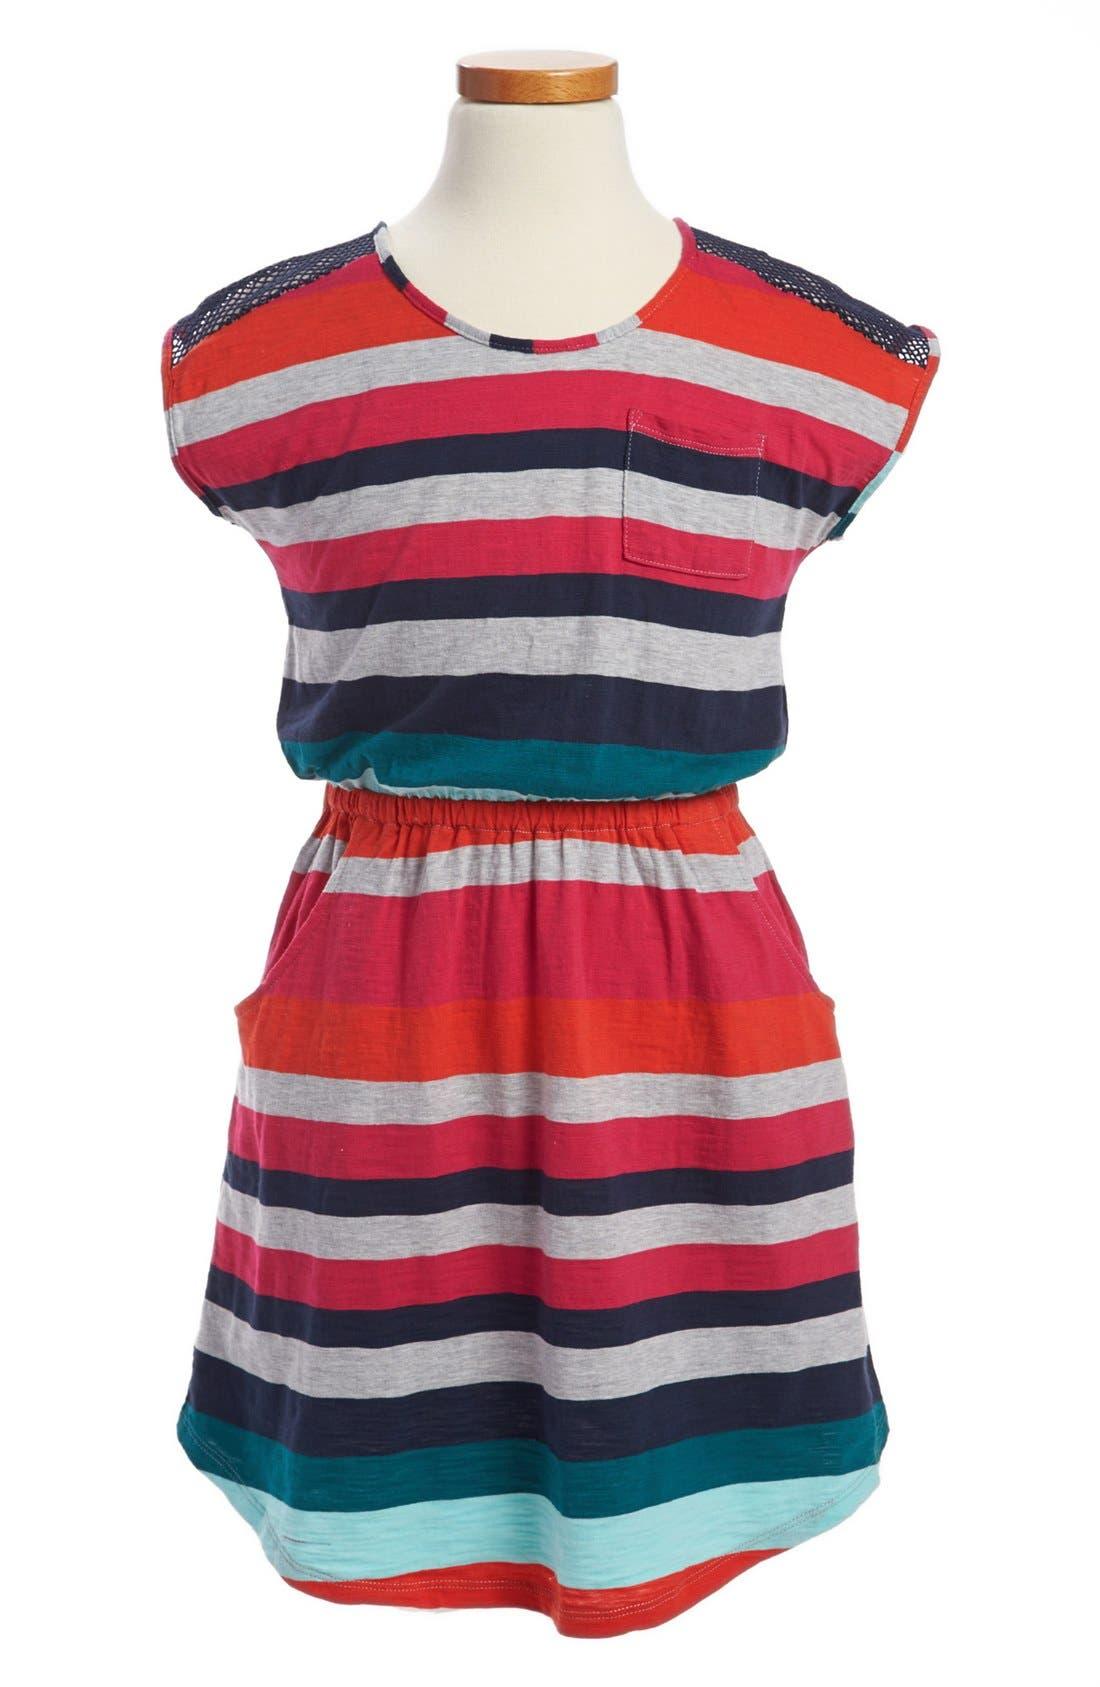 Main Image - Roxy 'First Glance' Knit Dress (Big Girls)